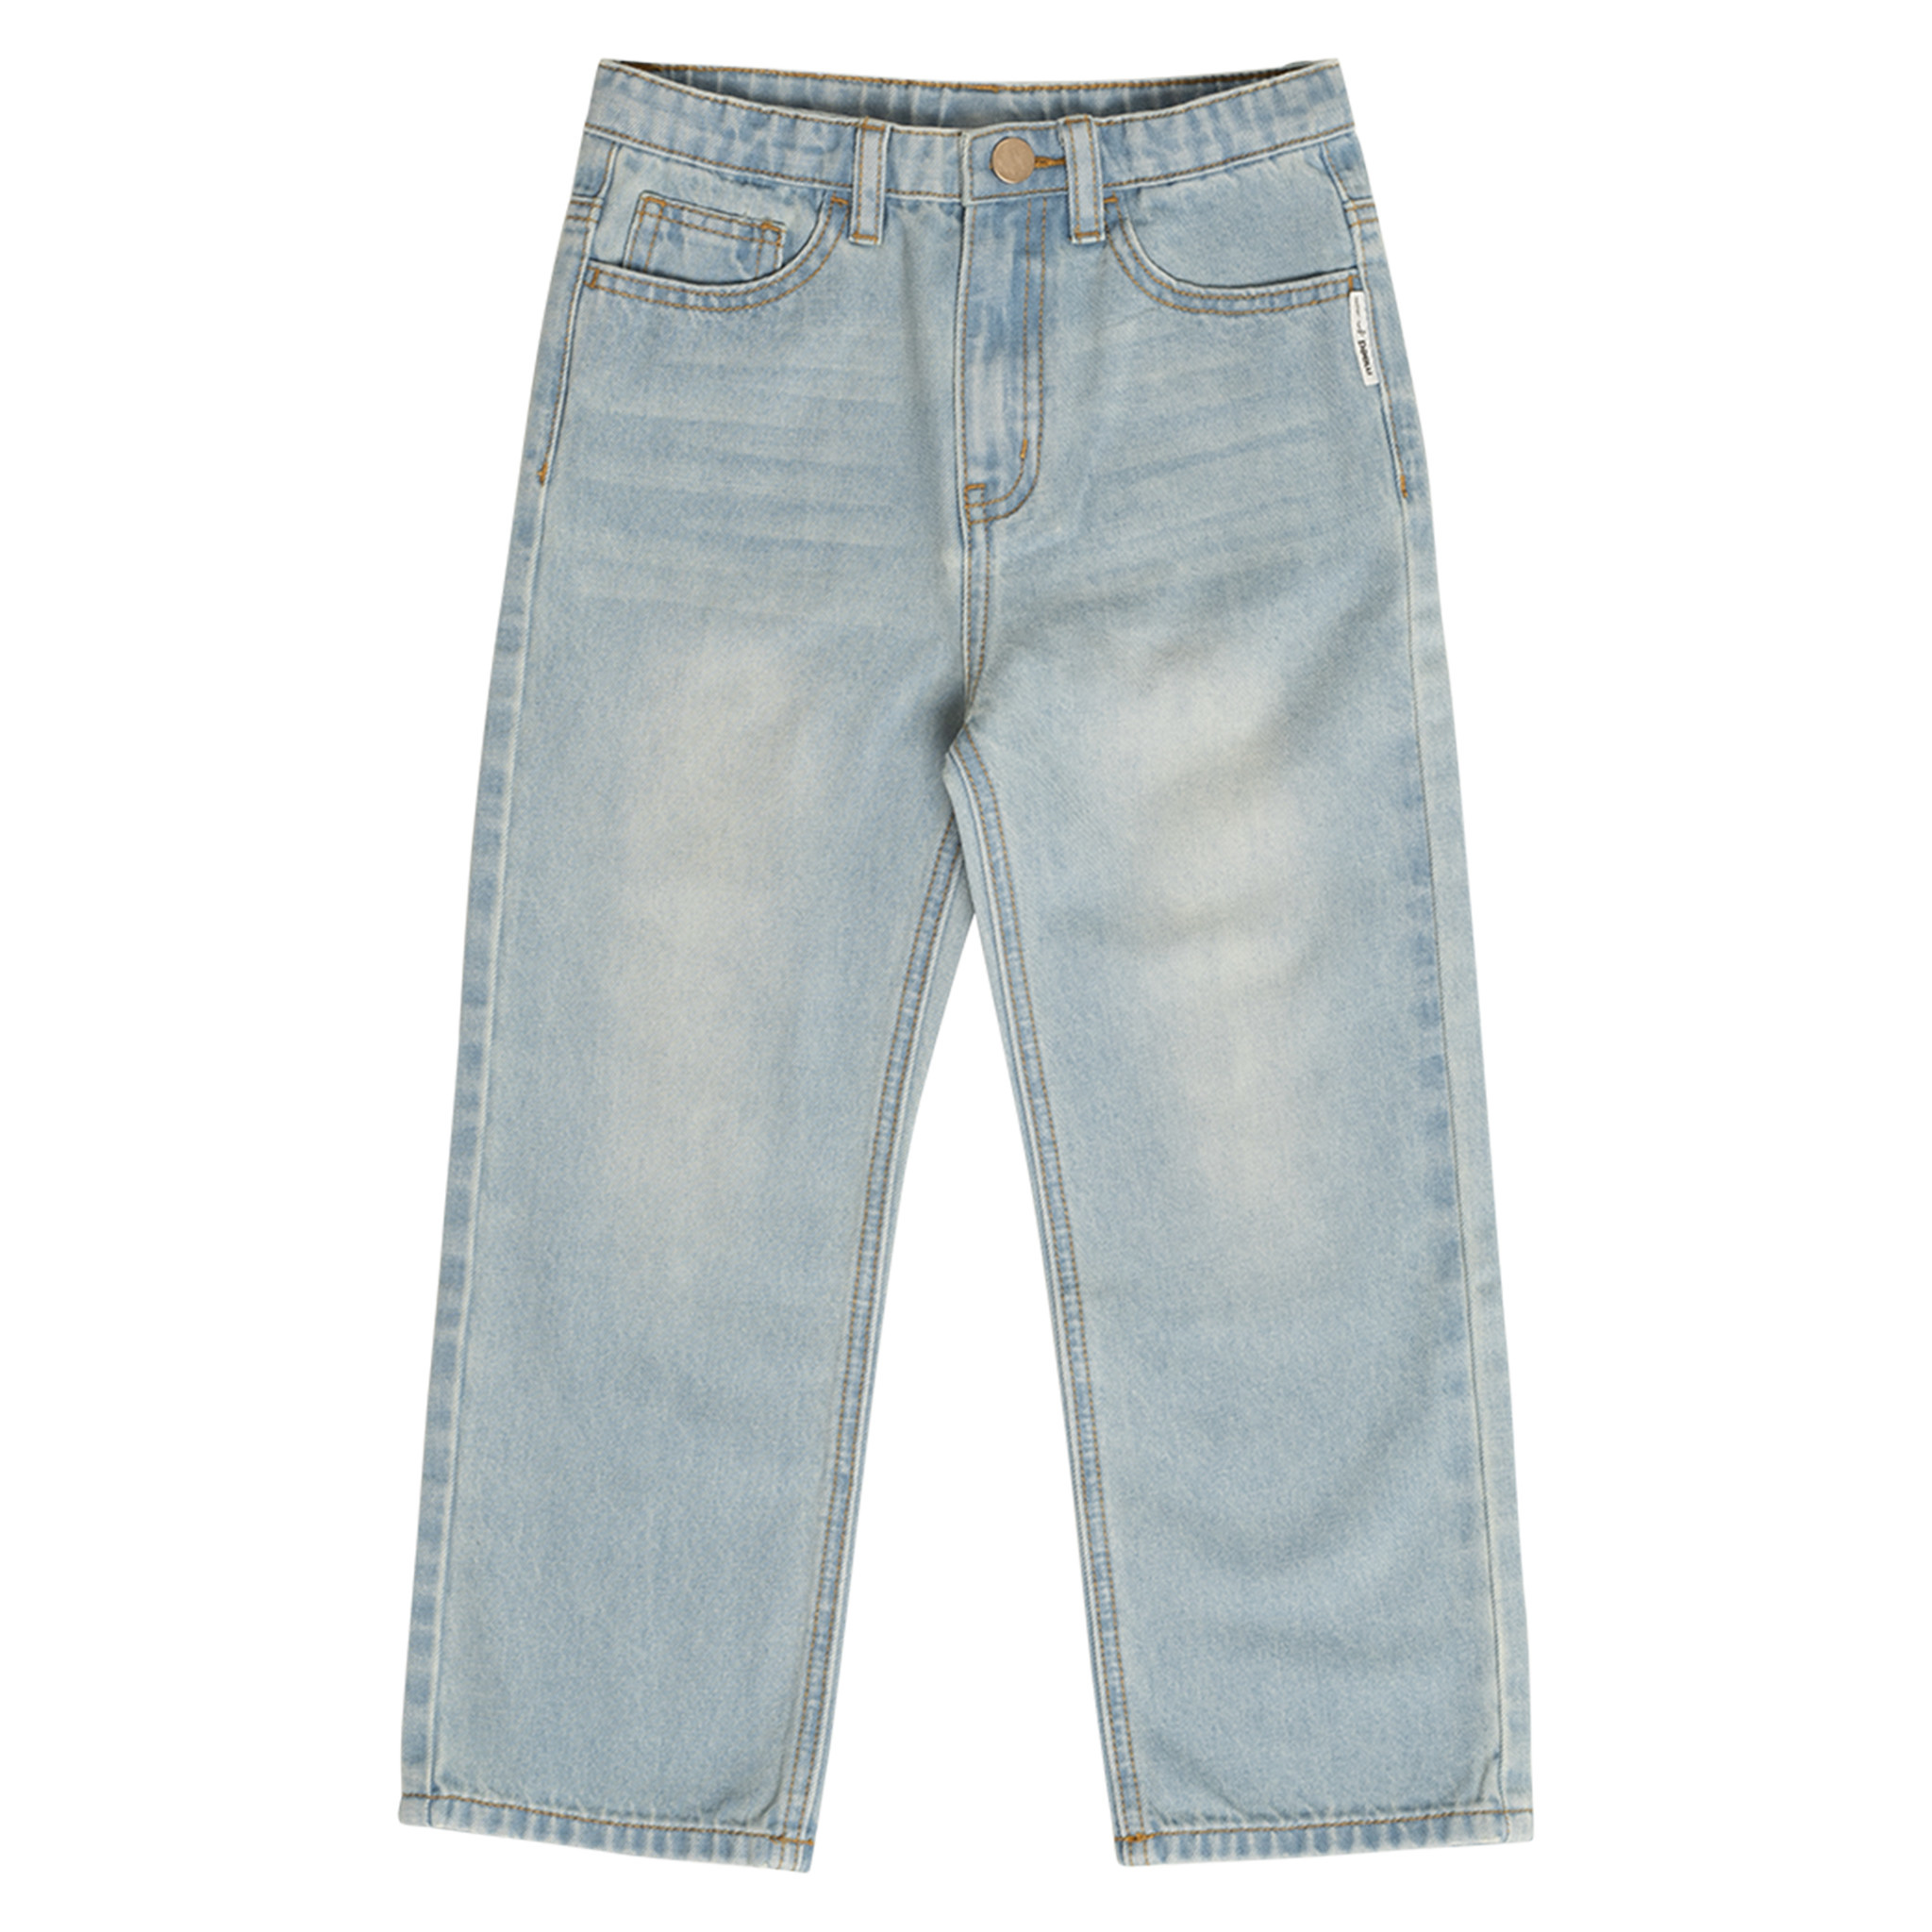 Balanced bull jeans-1